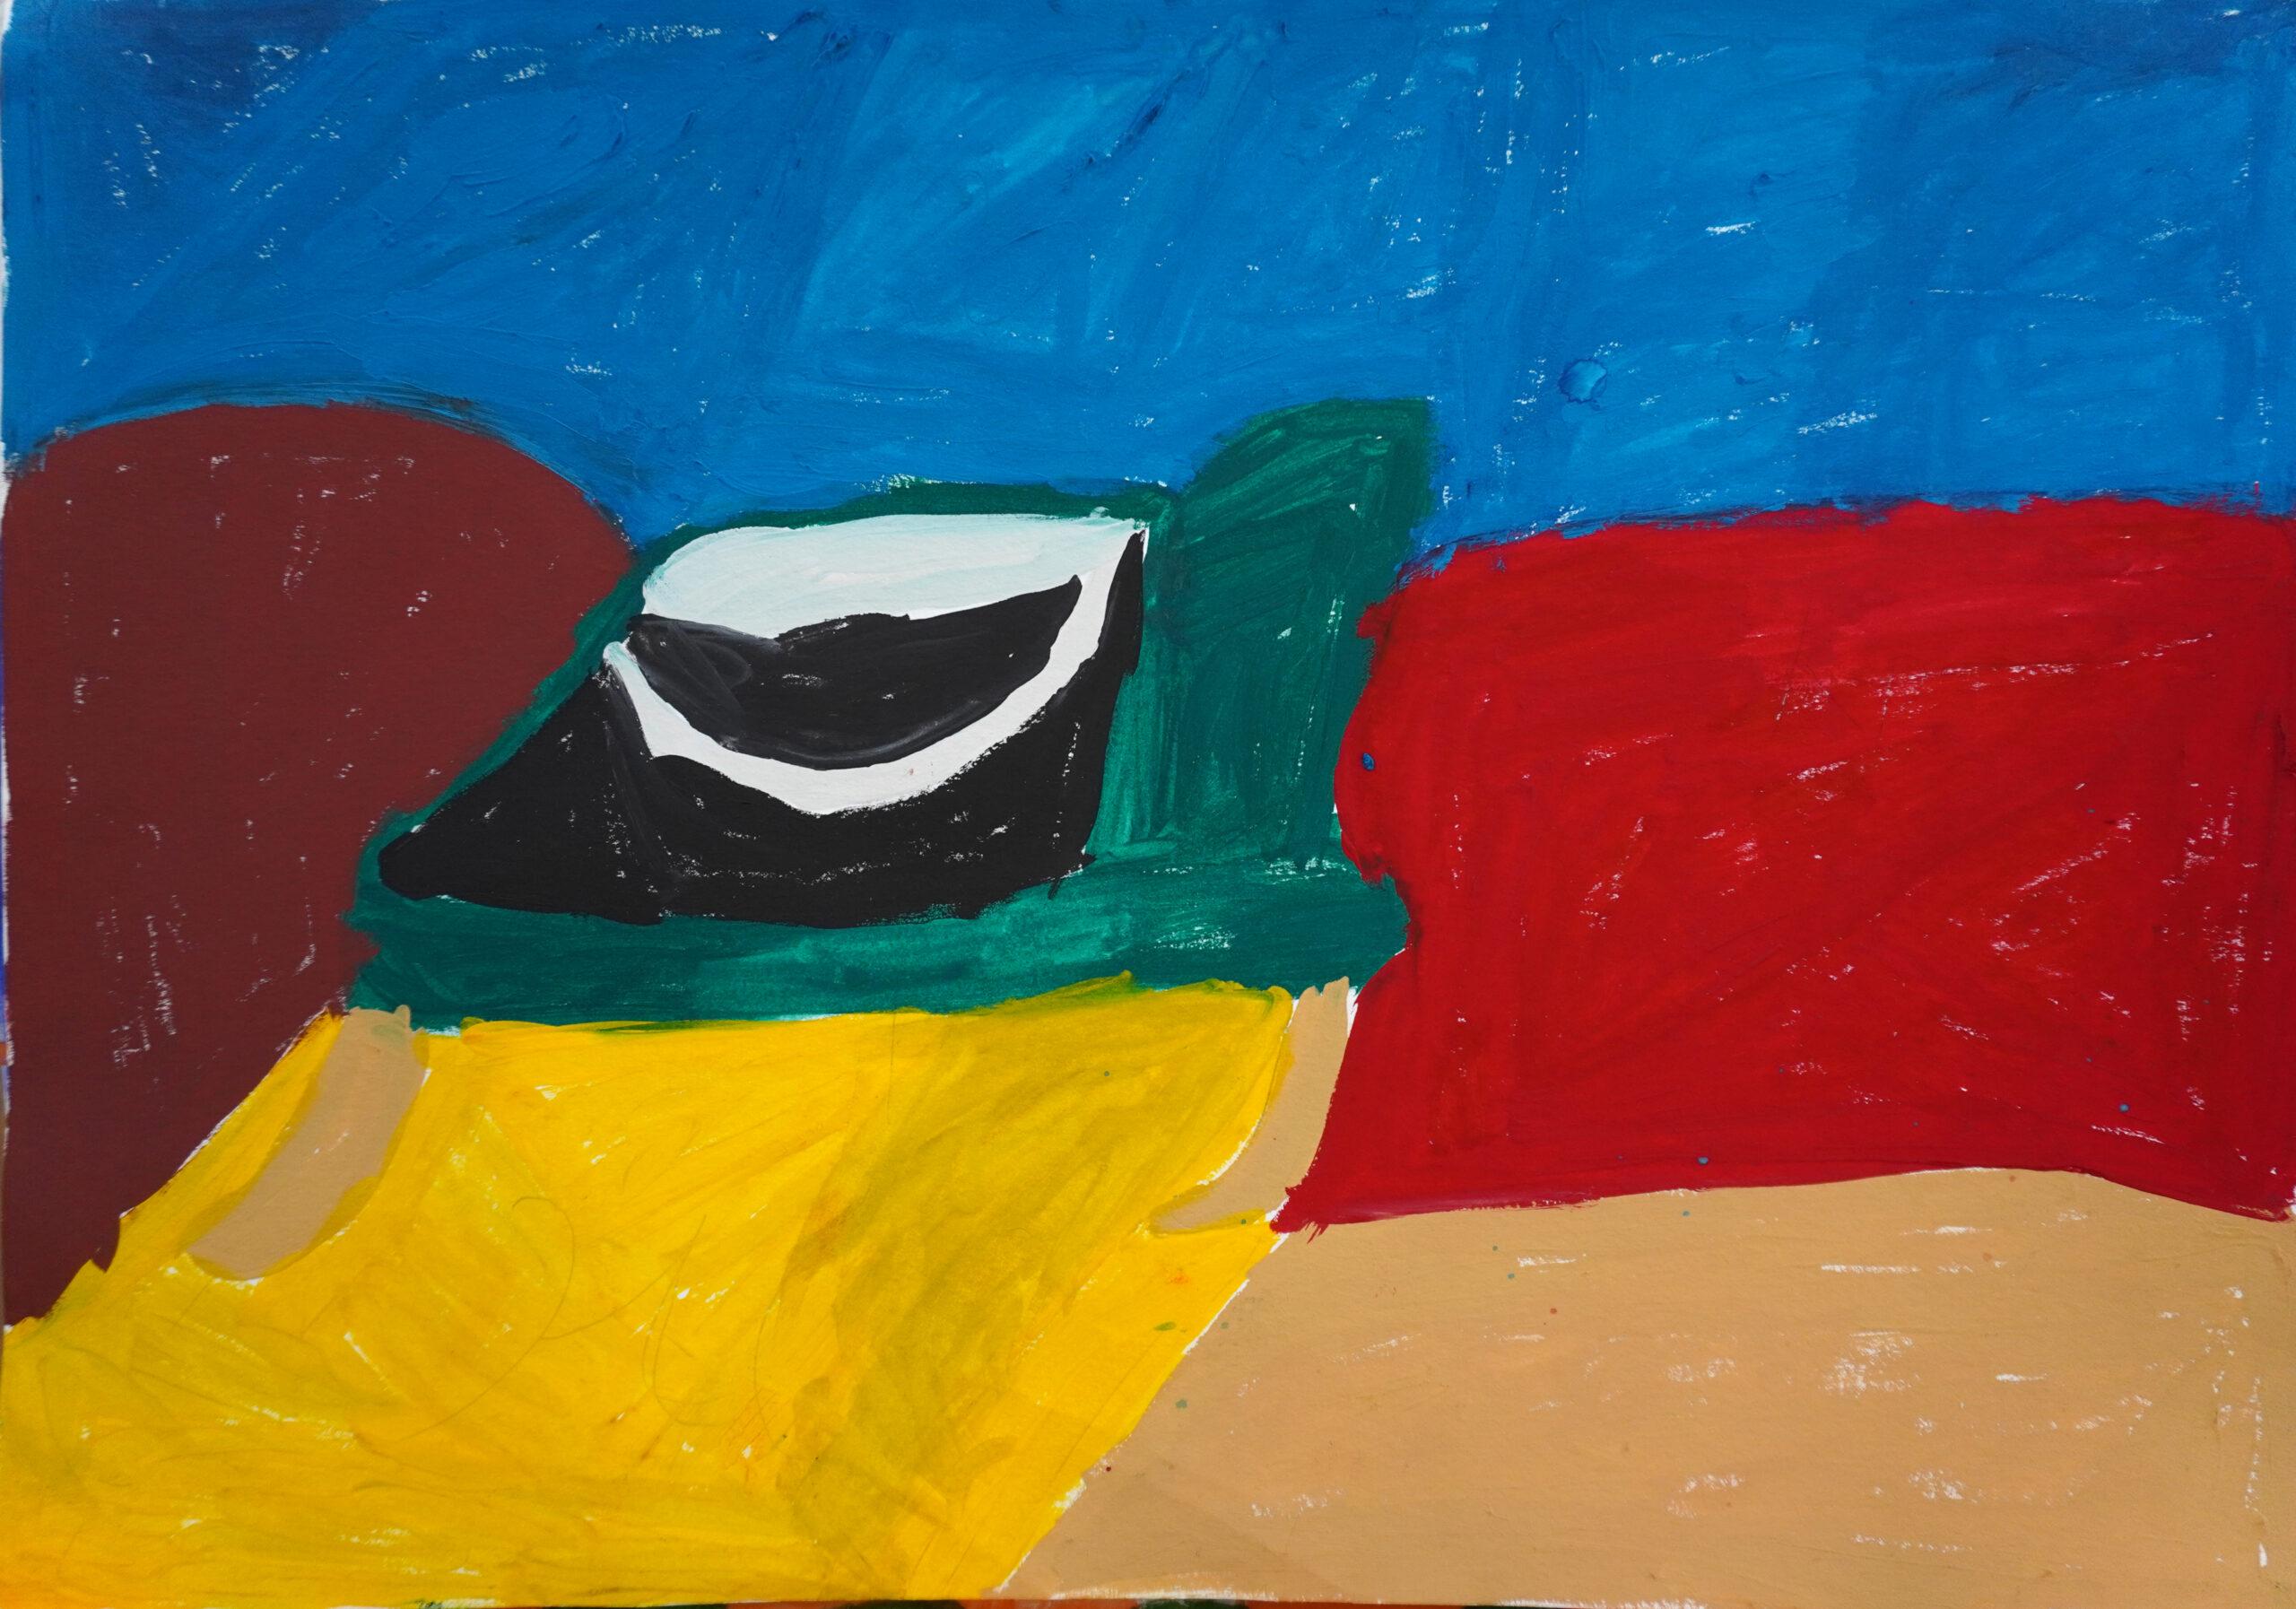 Ганна Сапон, Multicolored background bucket scaled